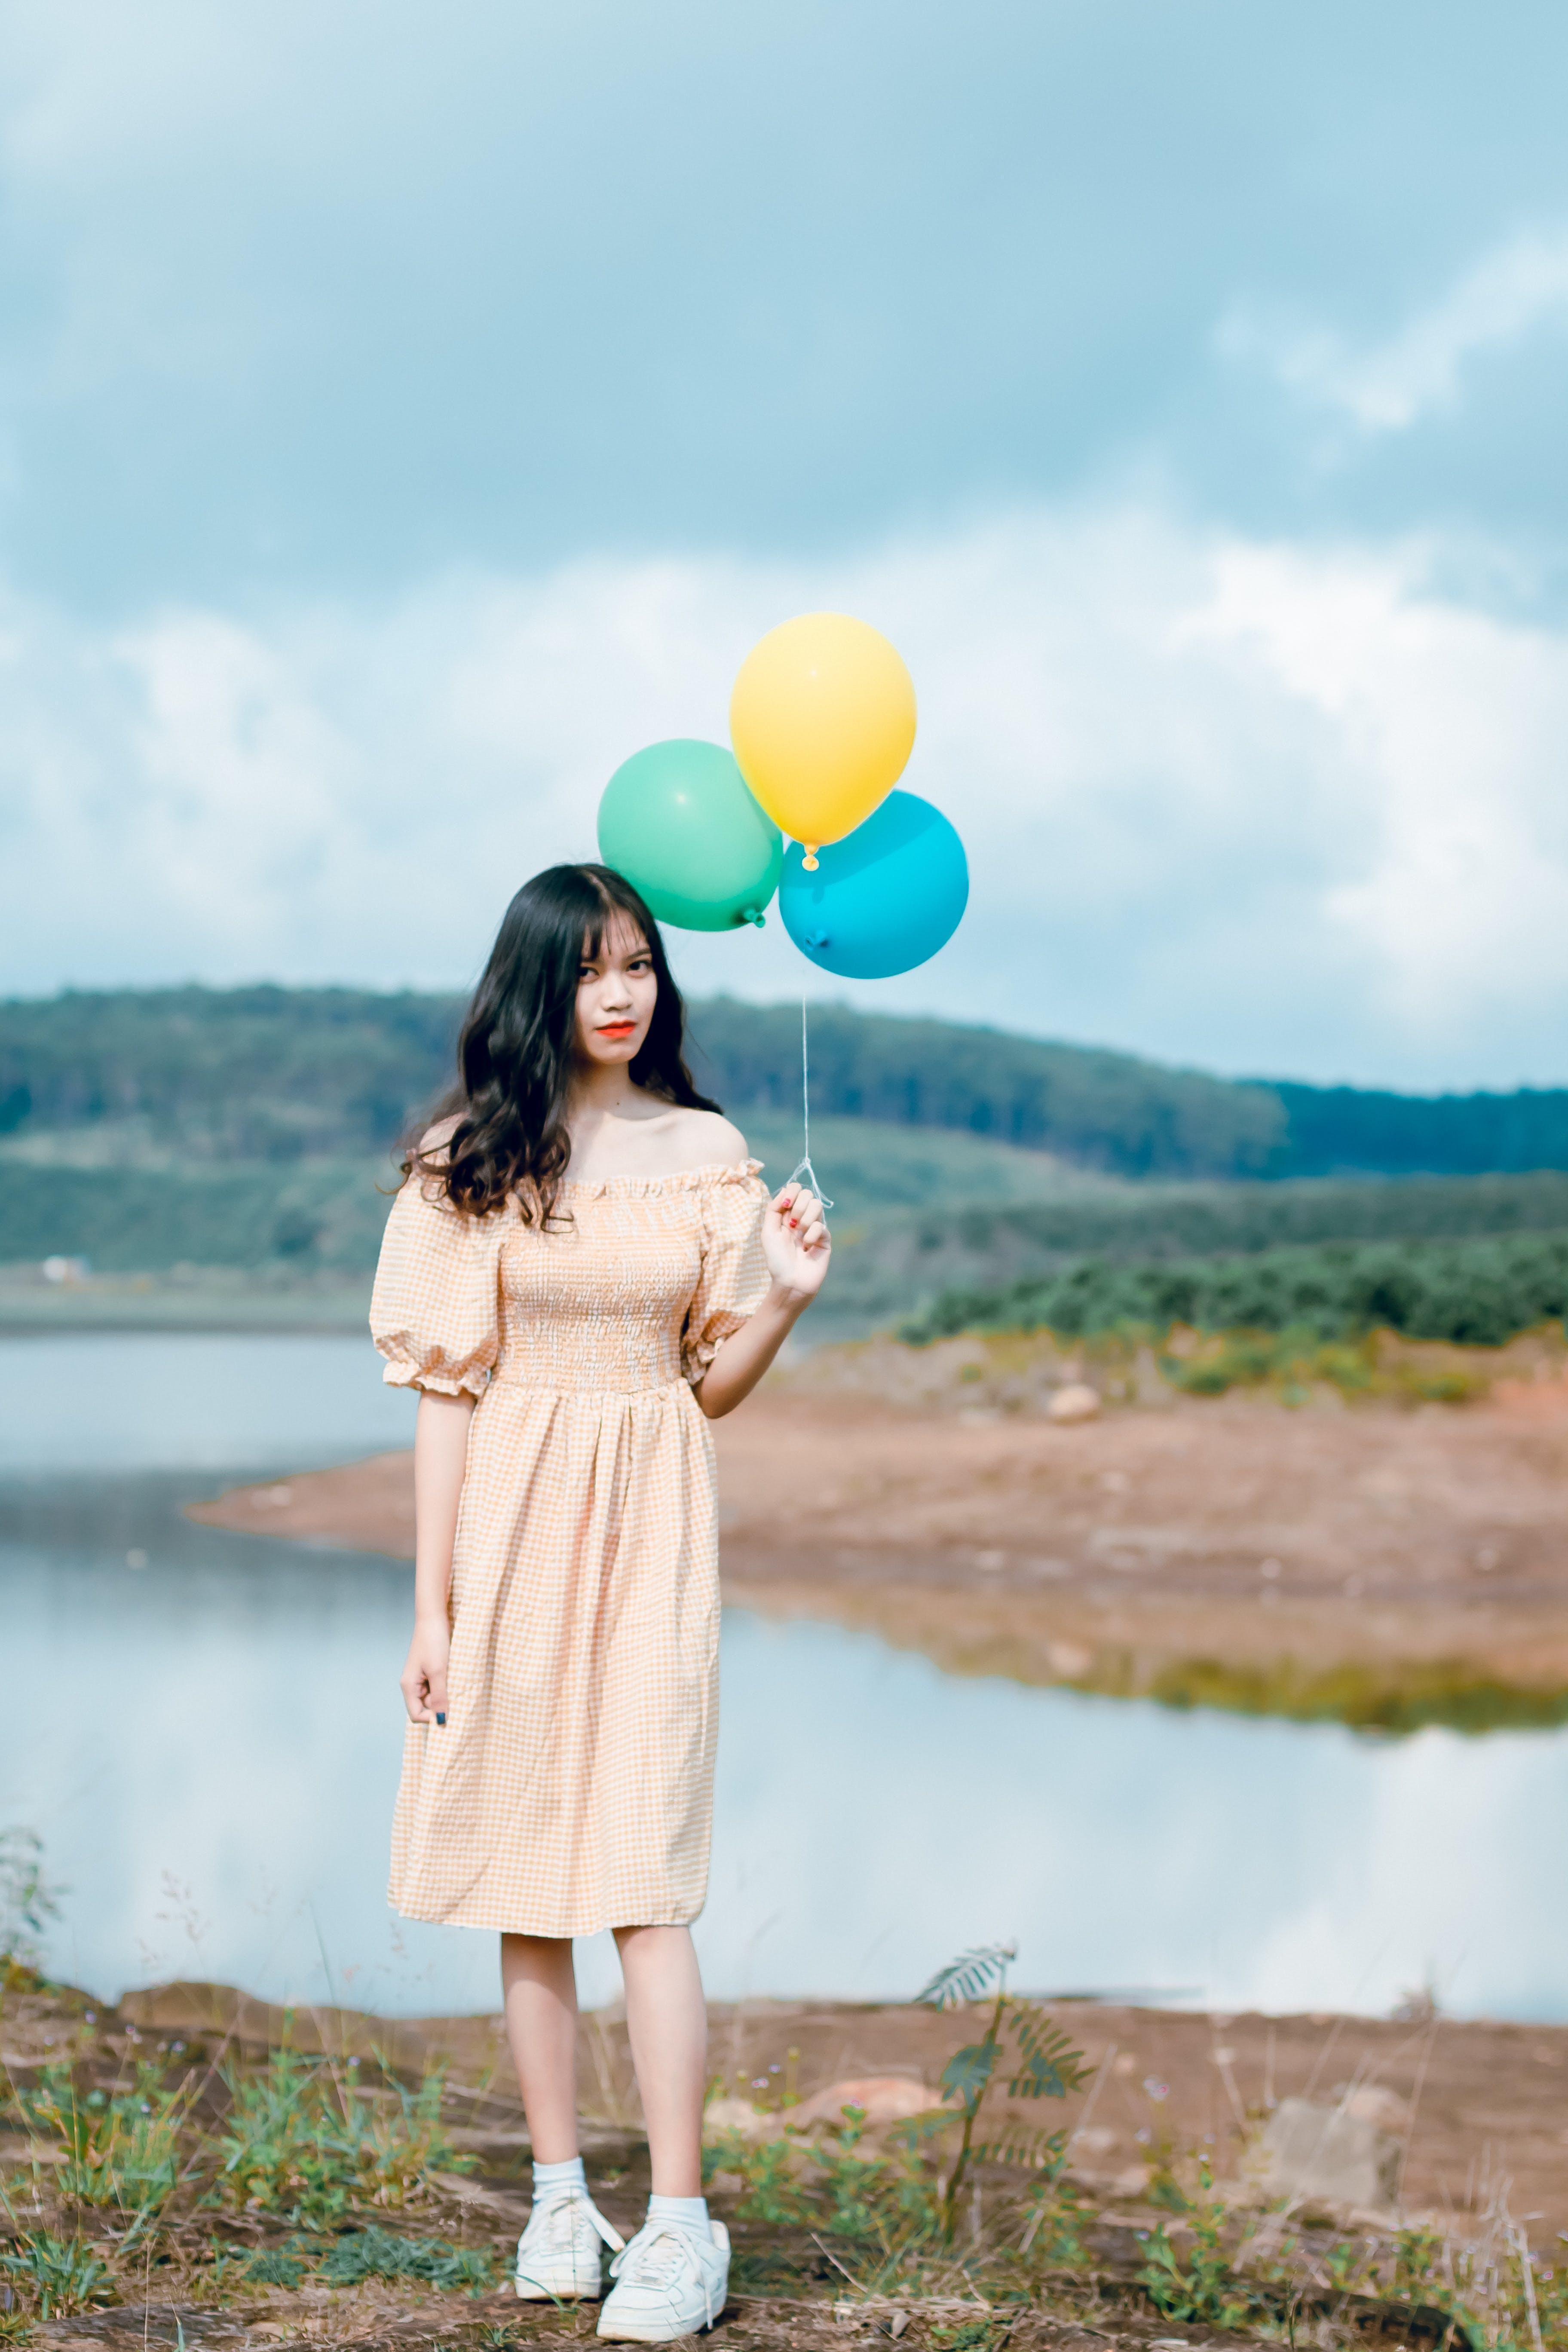 Fotos de stock gratuitas de adulto, agua, alegría, asiática